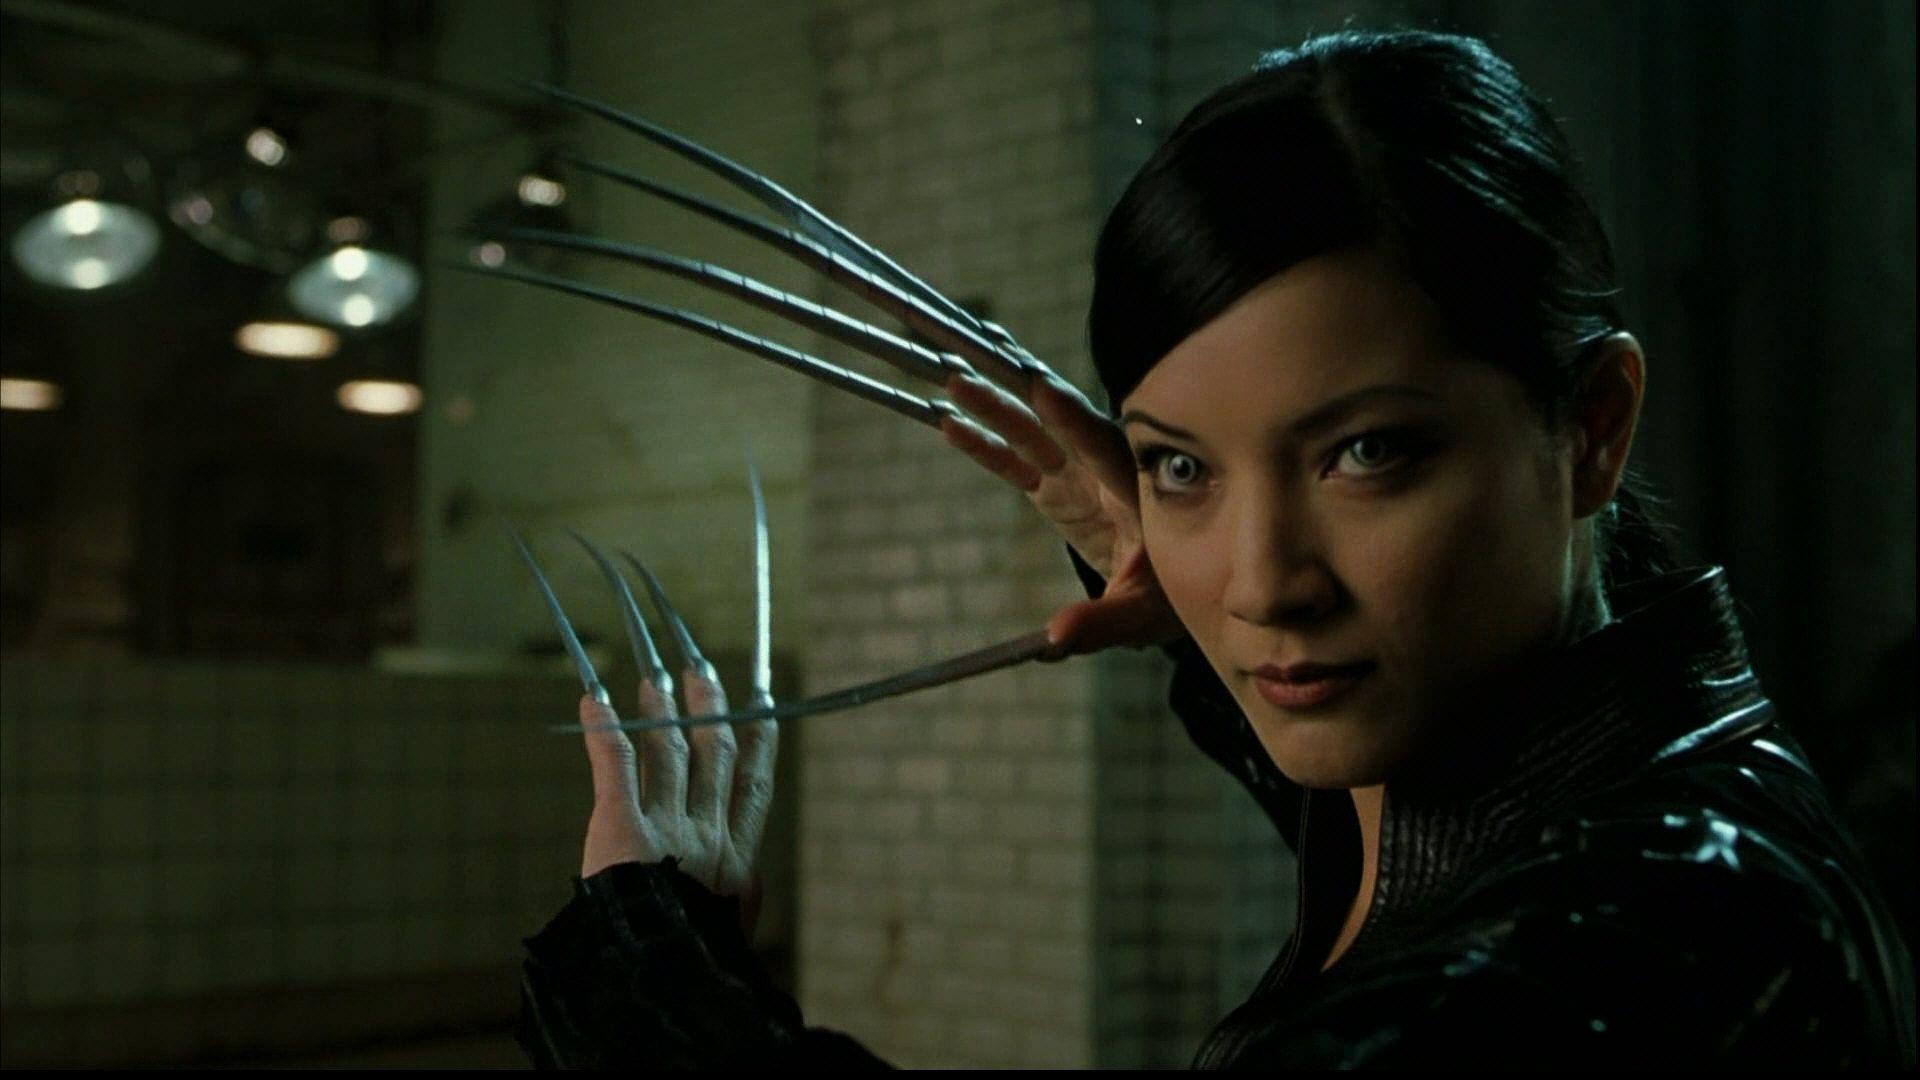 Lady Deathstrike | Lady deathstrike, Kelly hu, X men